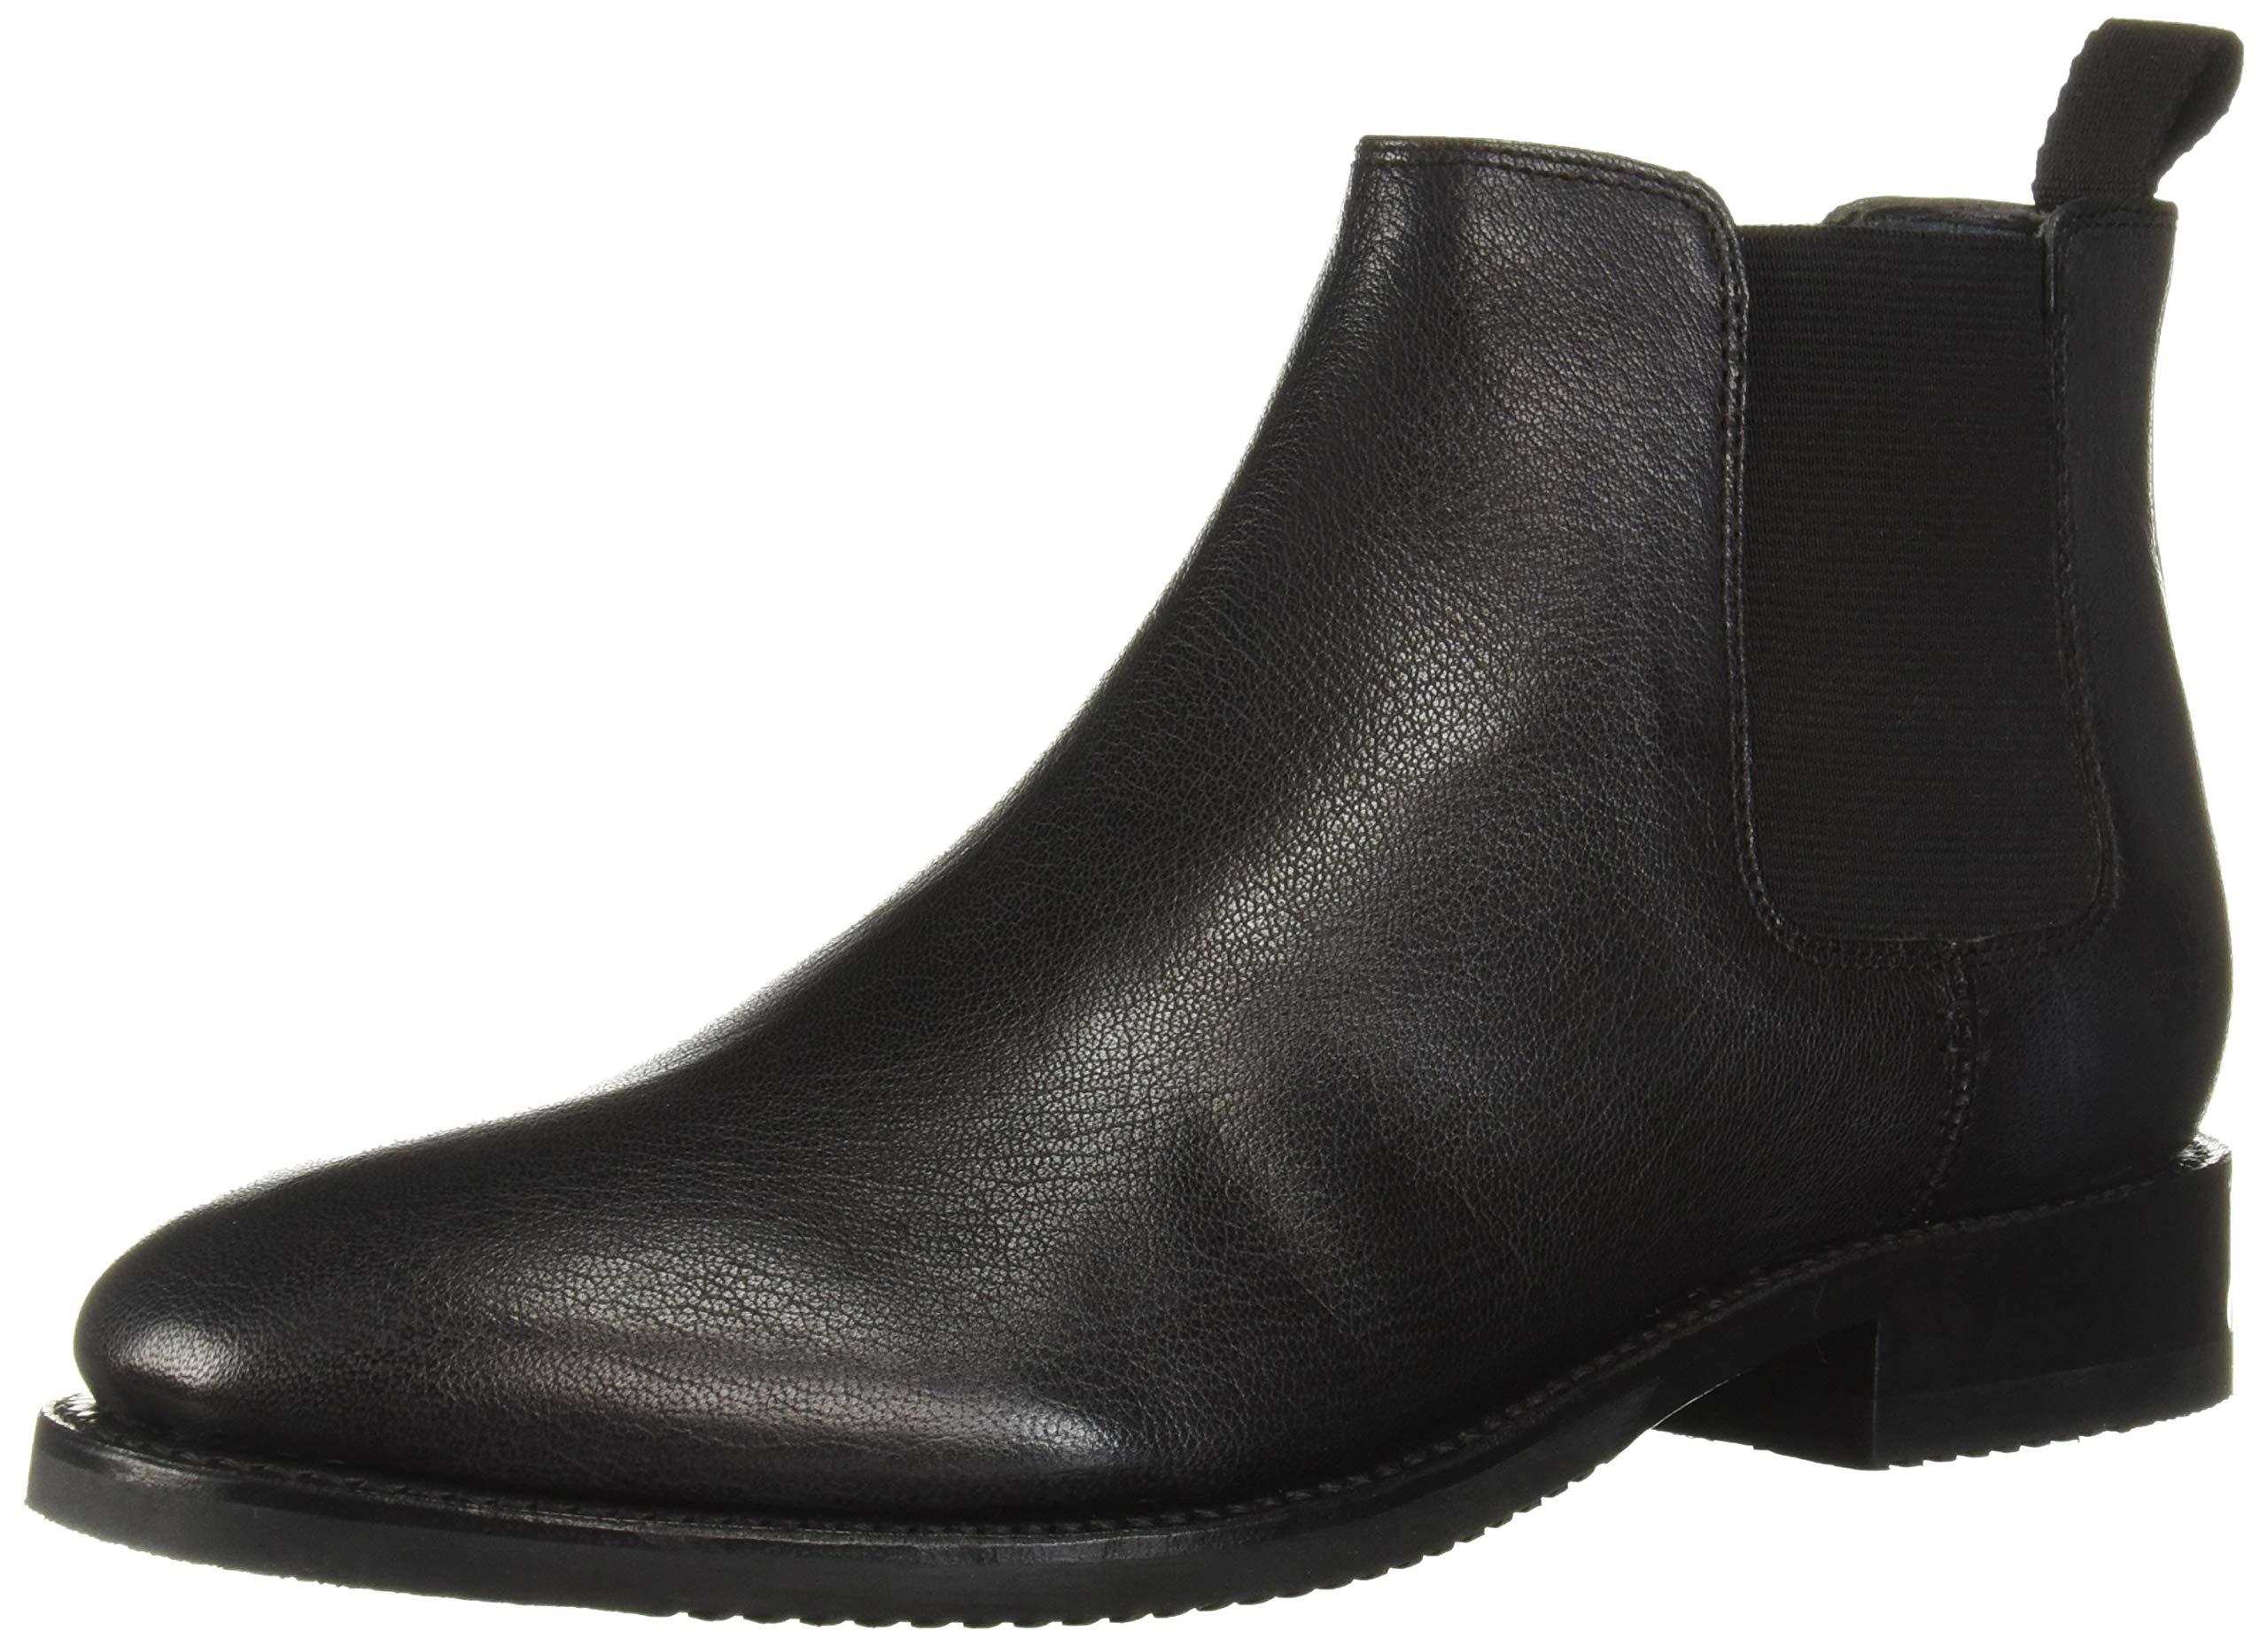 FRYE Men's Corey Chelsea Boot, Black, 11 M Medium US